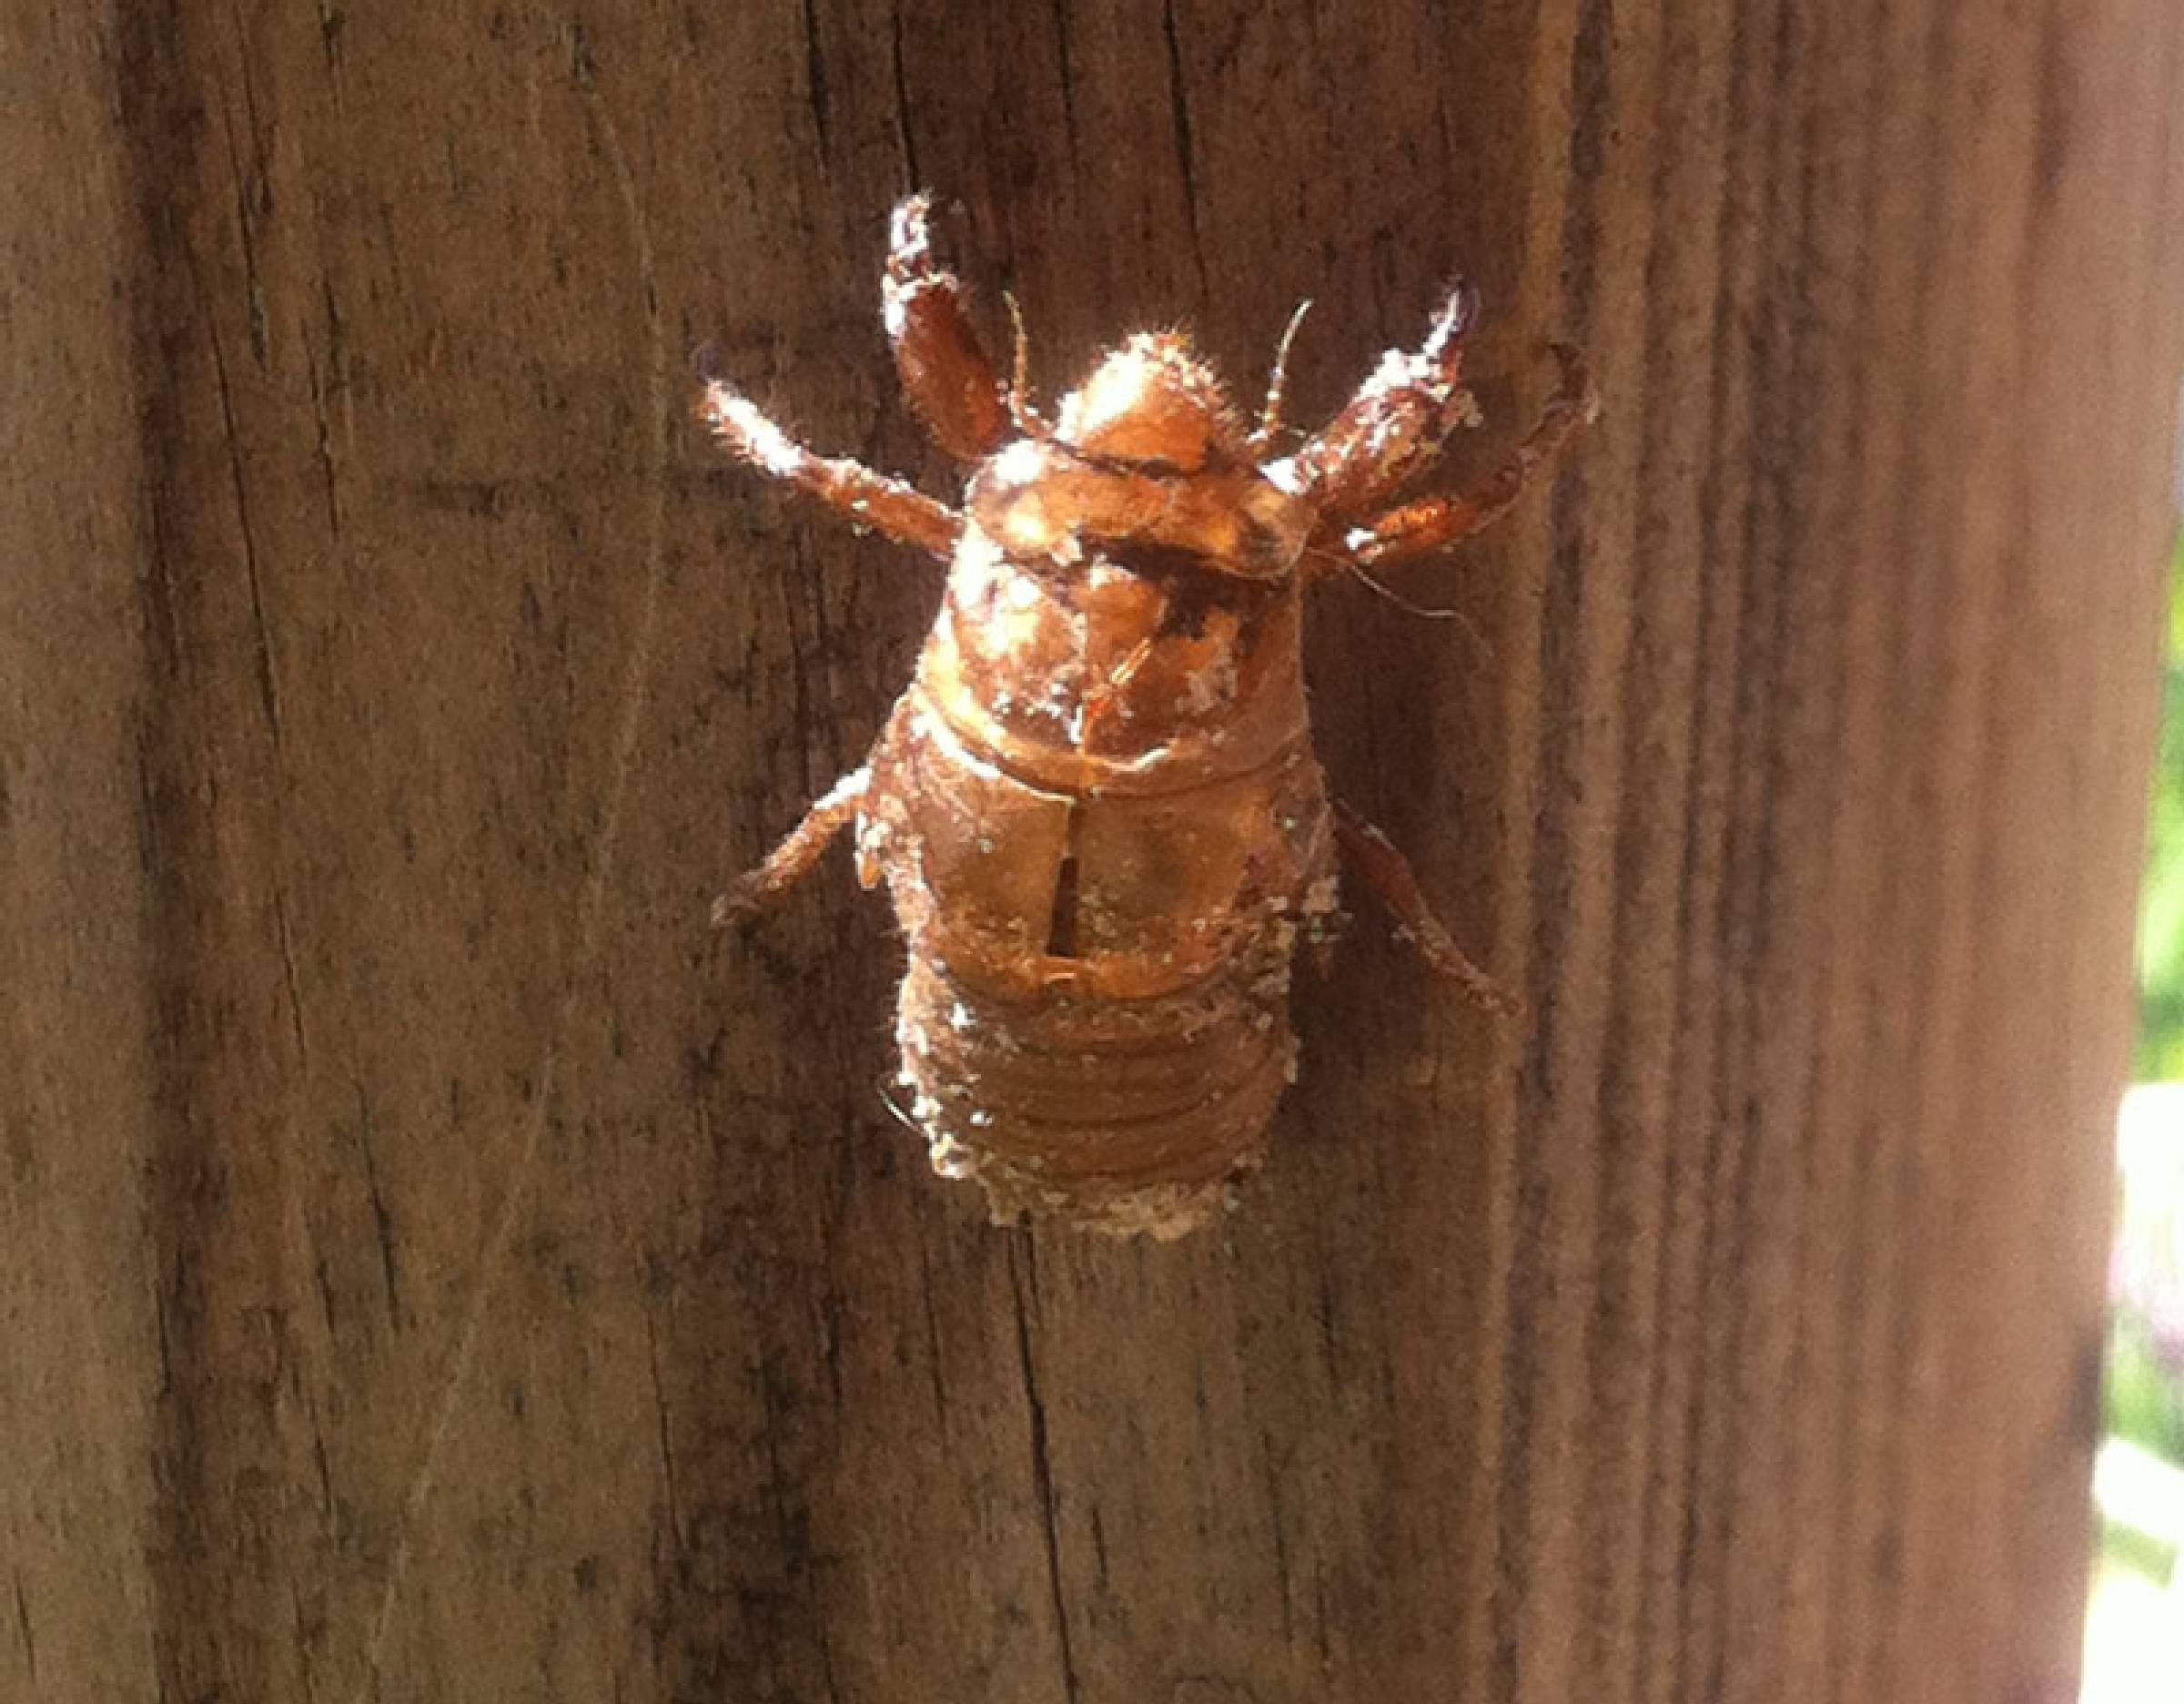 The Bug Cicada